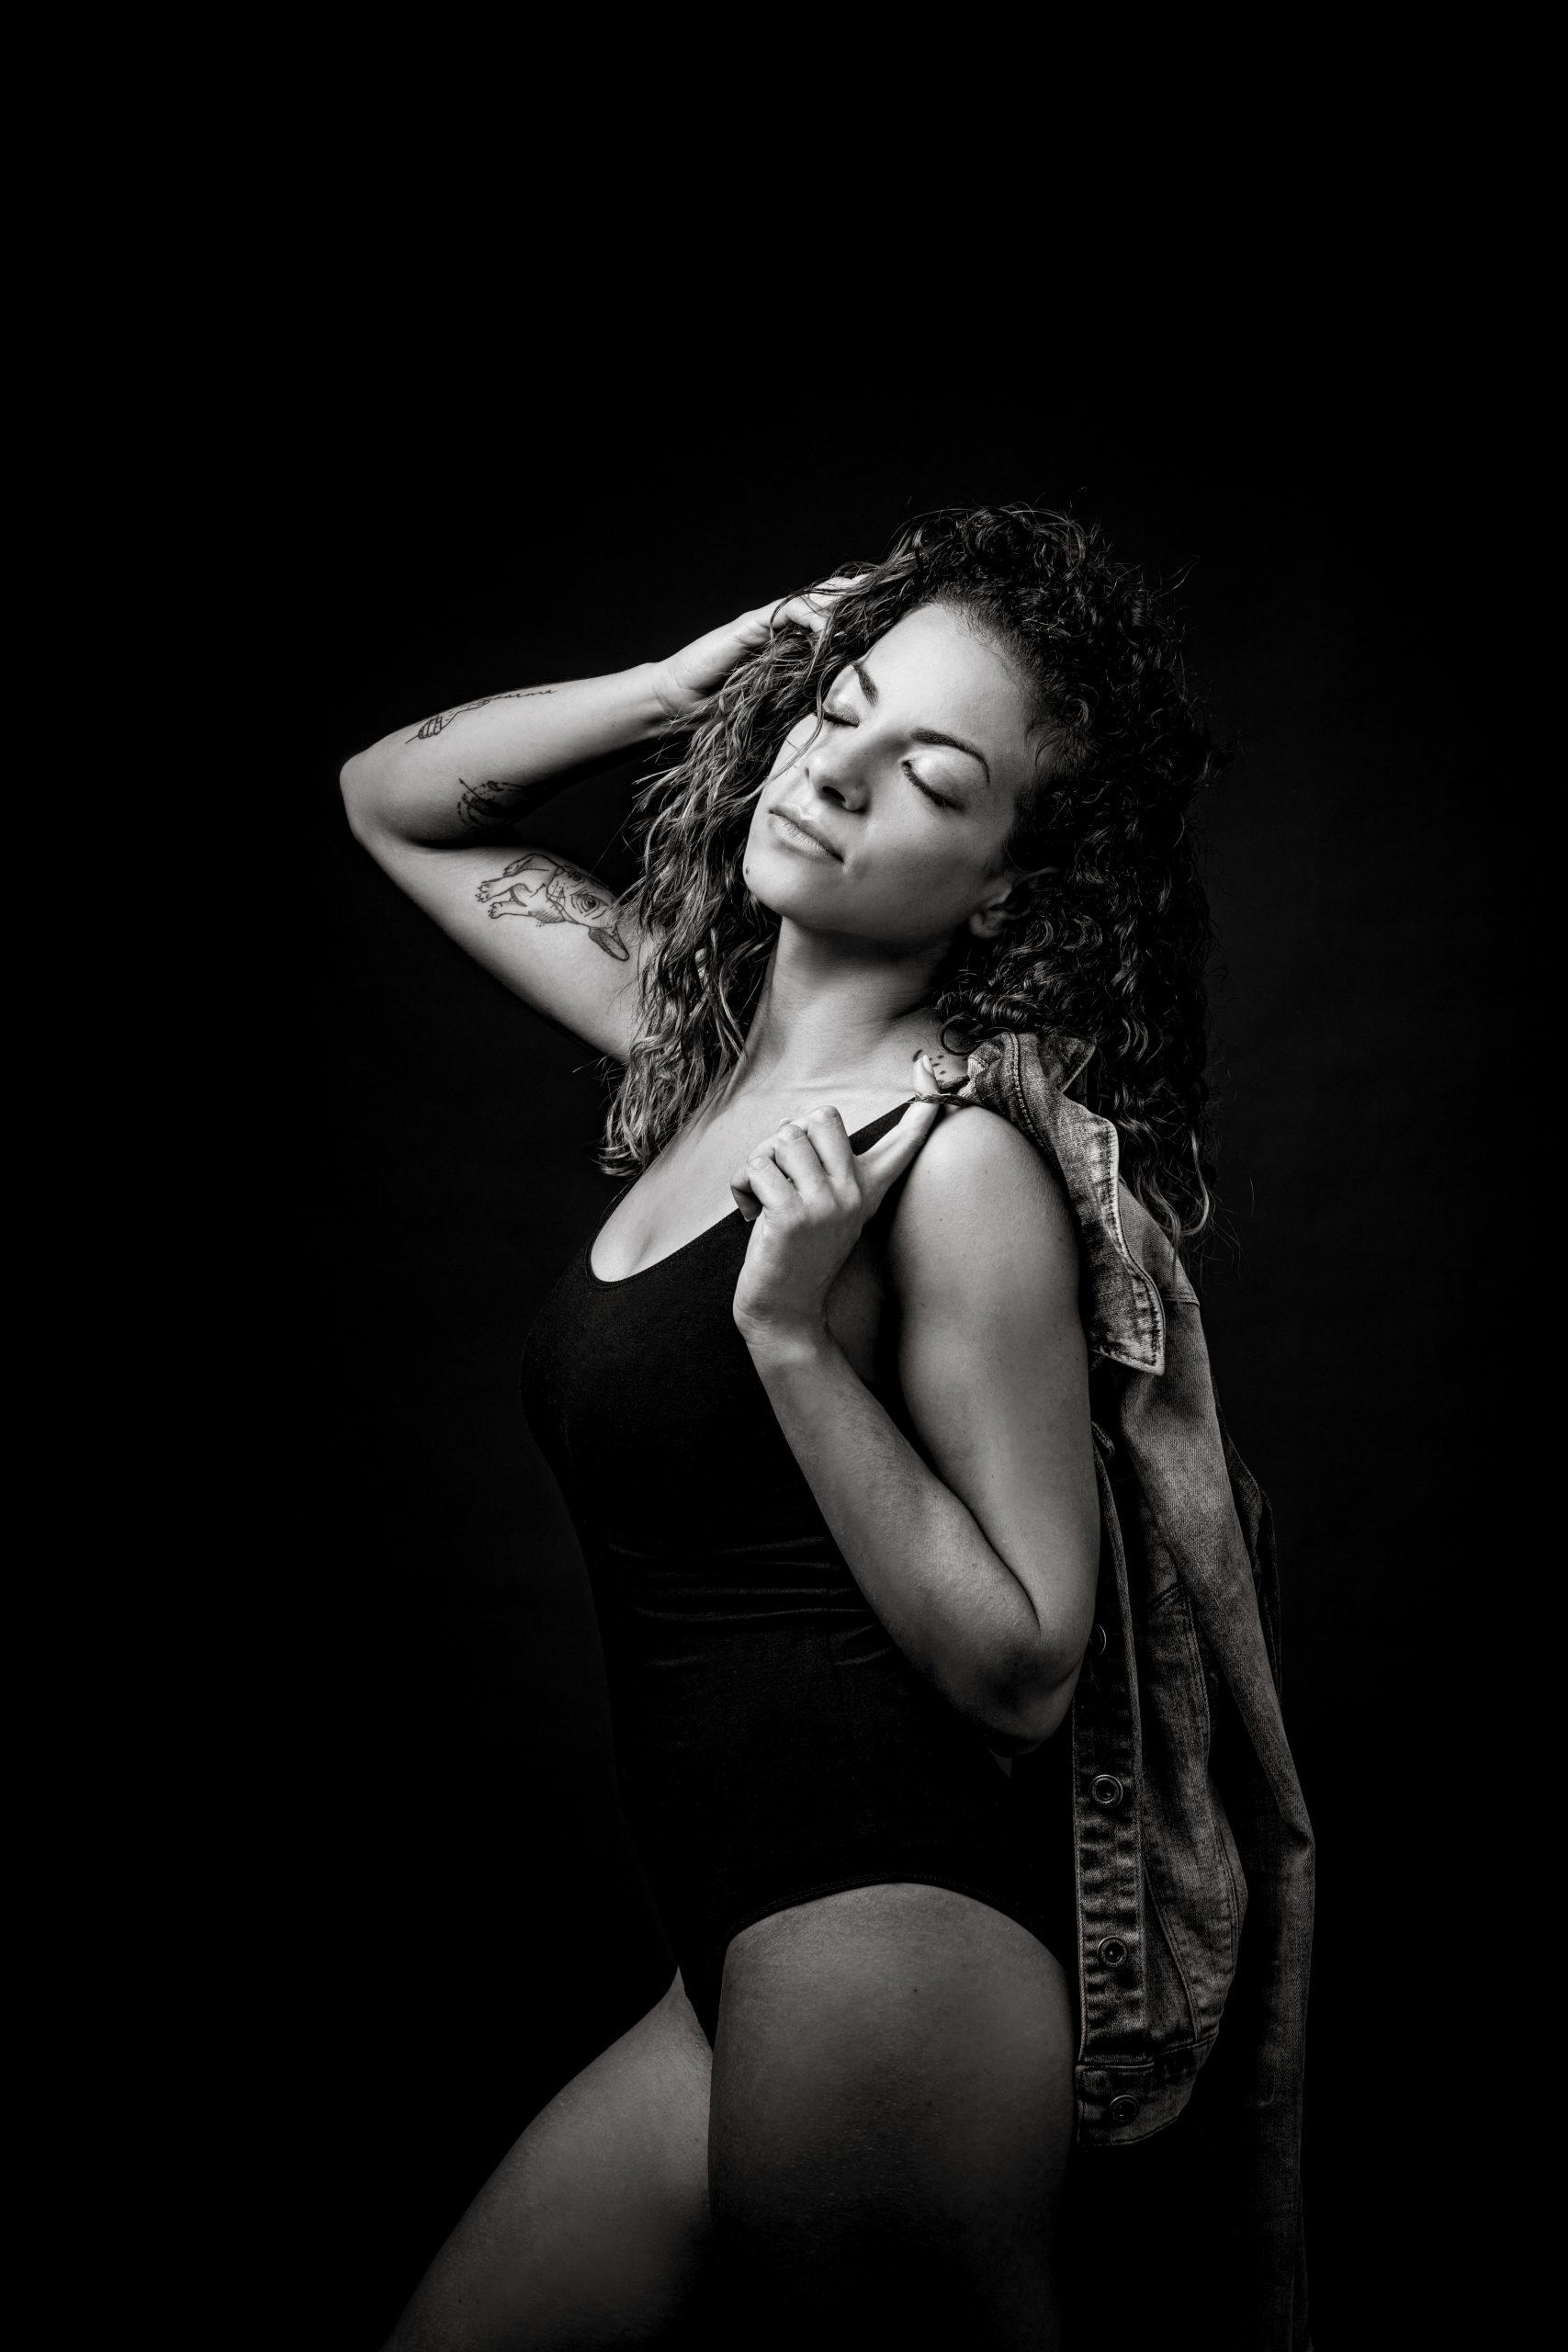 Lifestylephotodesign Melanieschmidt Beautyportrait Salwa 054